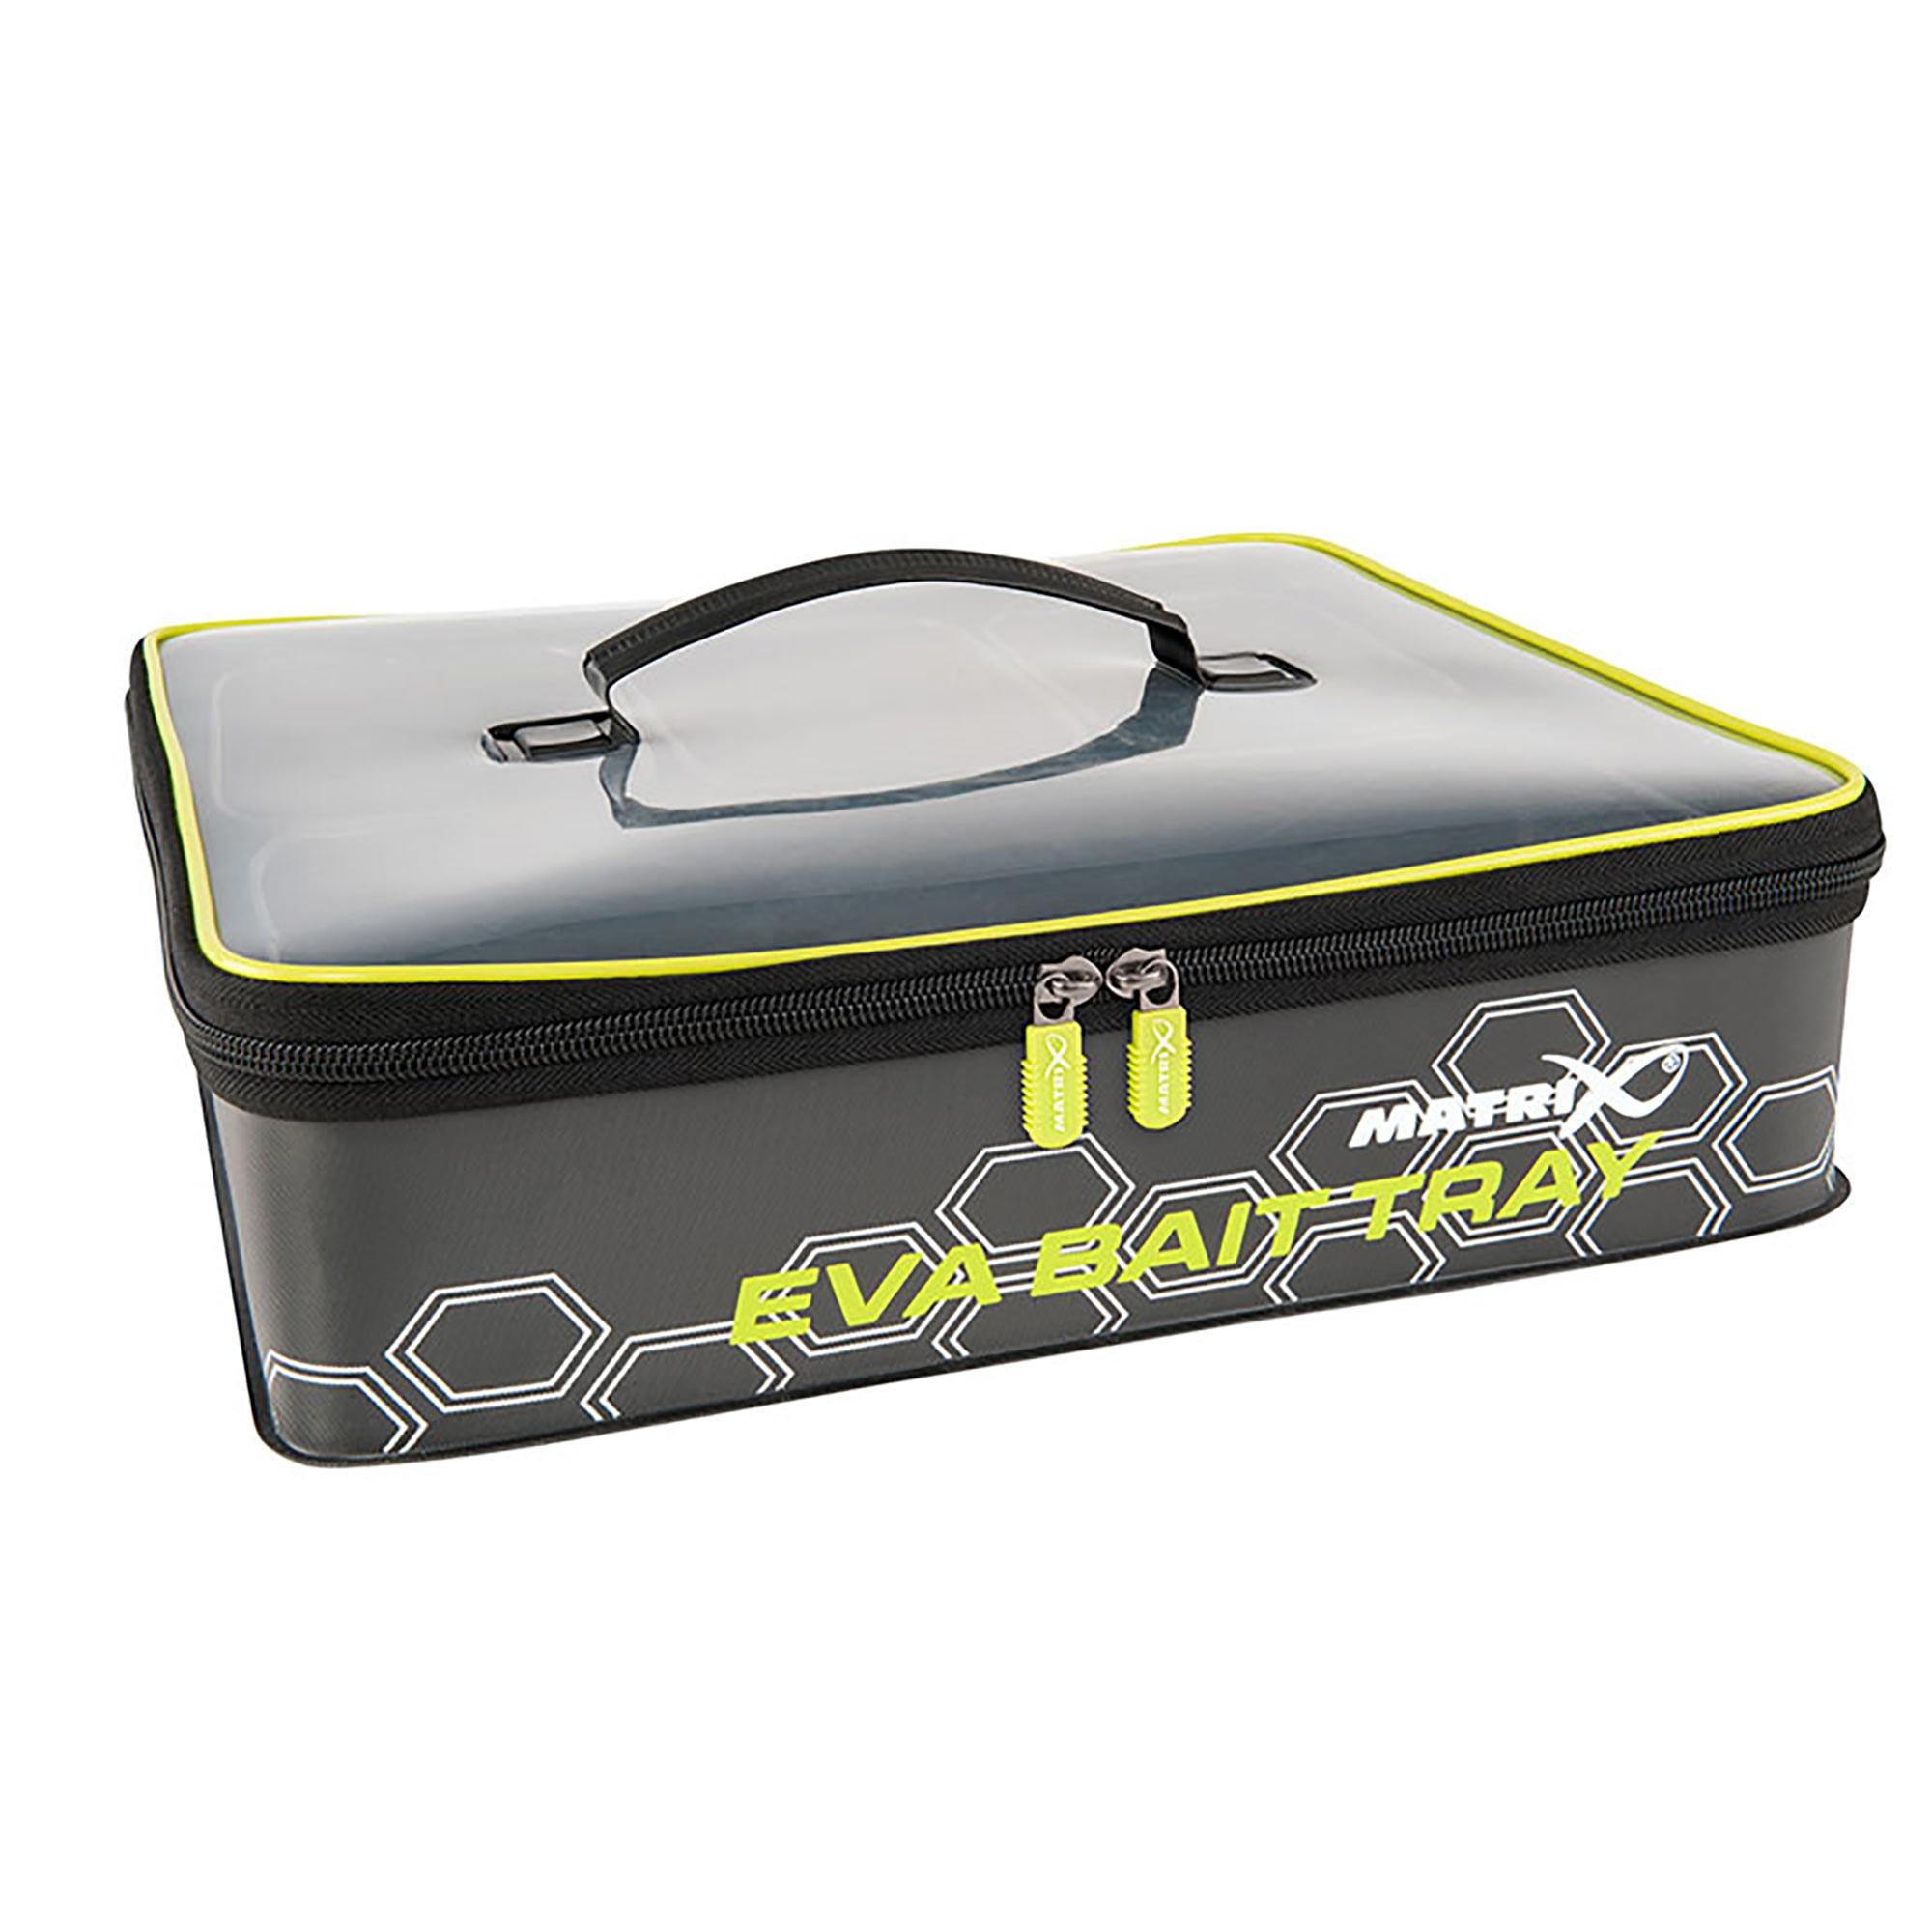 Set Pastura EVA Bait Tray 4 tubs - MATRIX (36x33x9,5 cm)